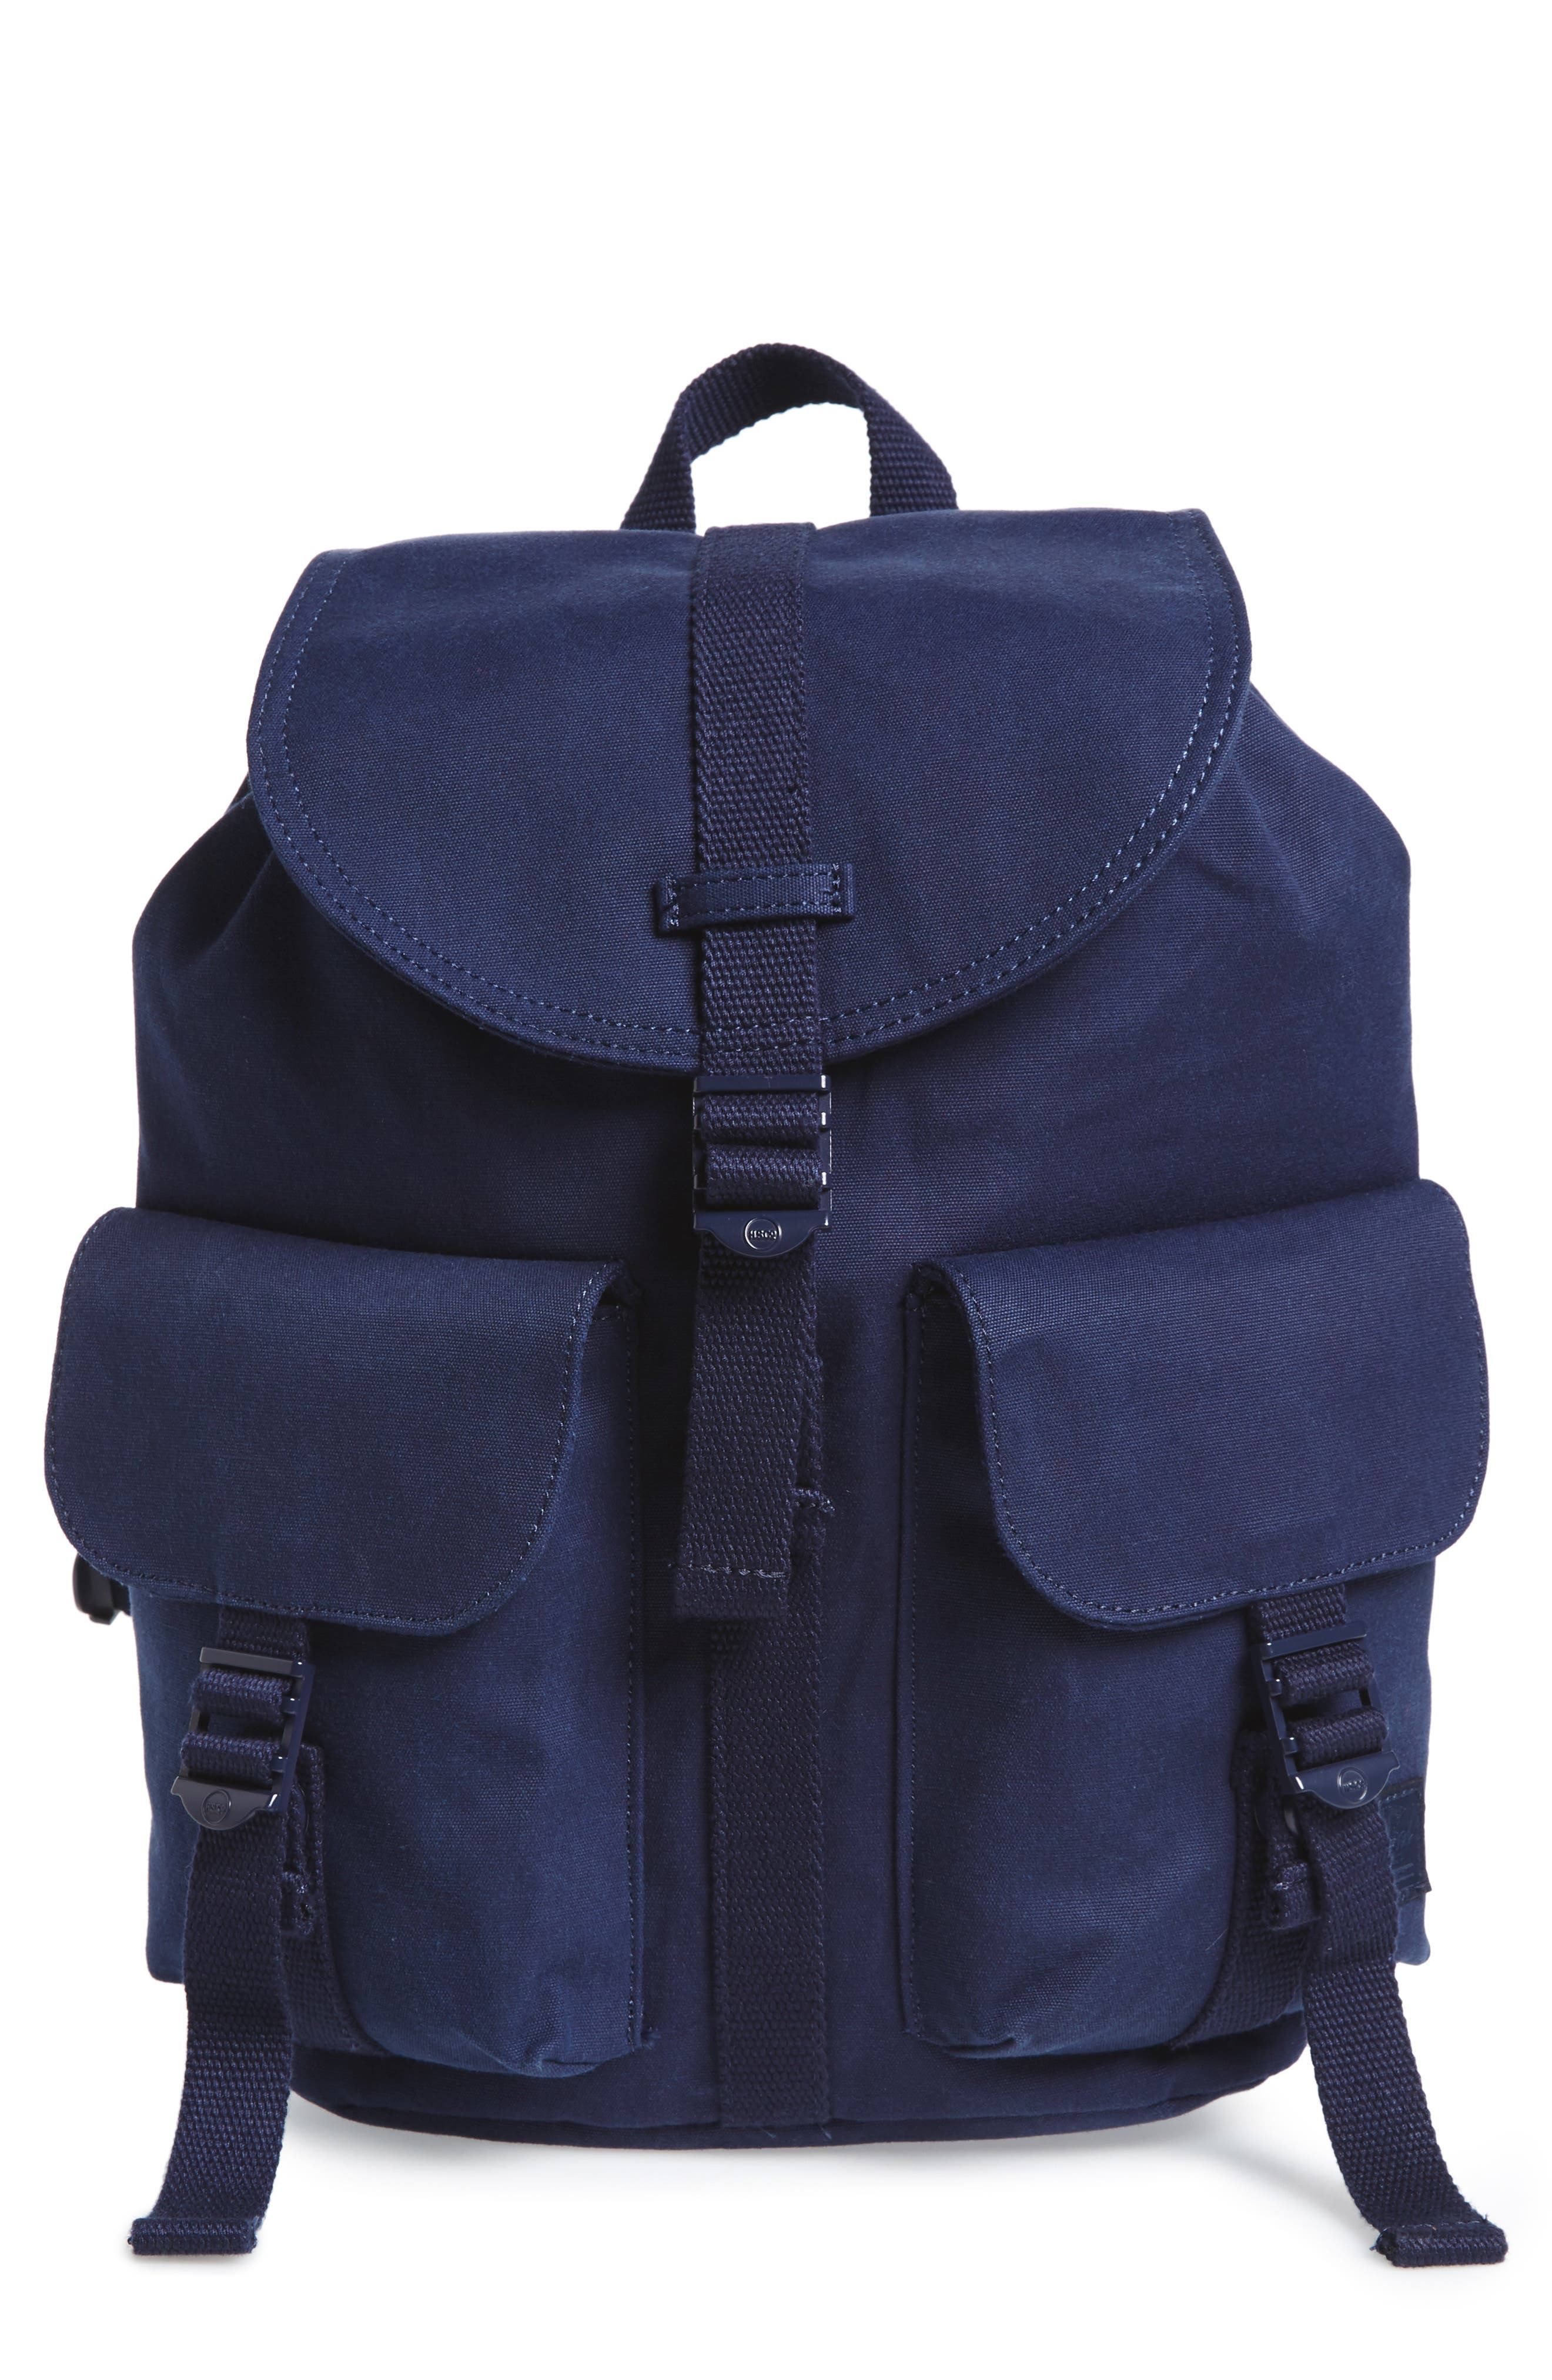 X-Small Dawson Canvas Backpack,                             Main thumbnail 1, color,                             Peacoat